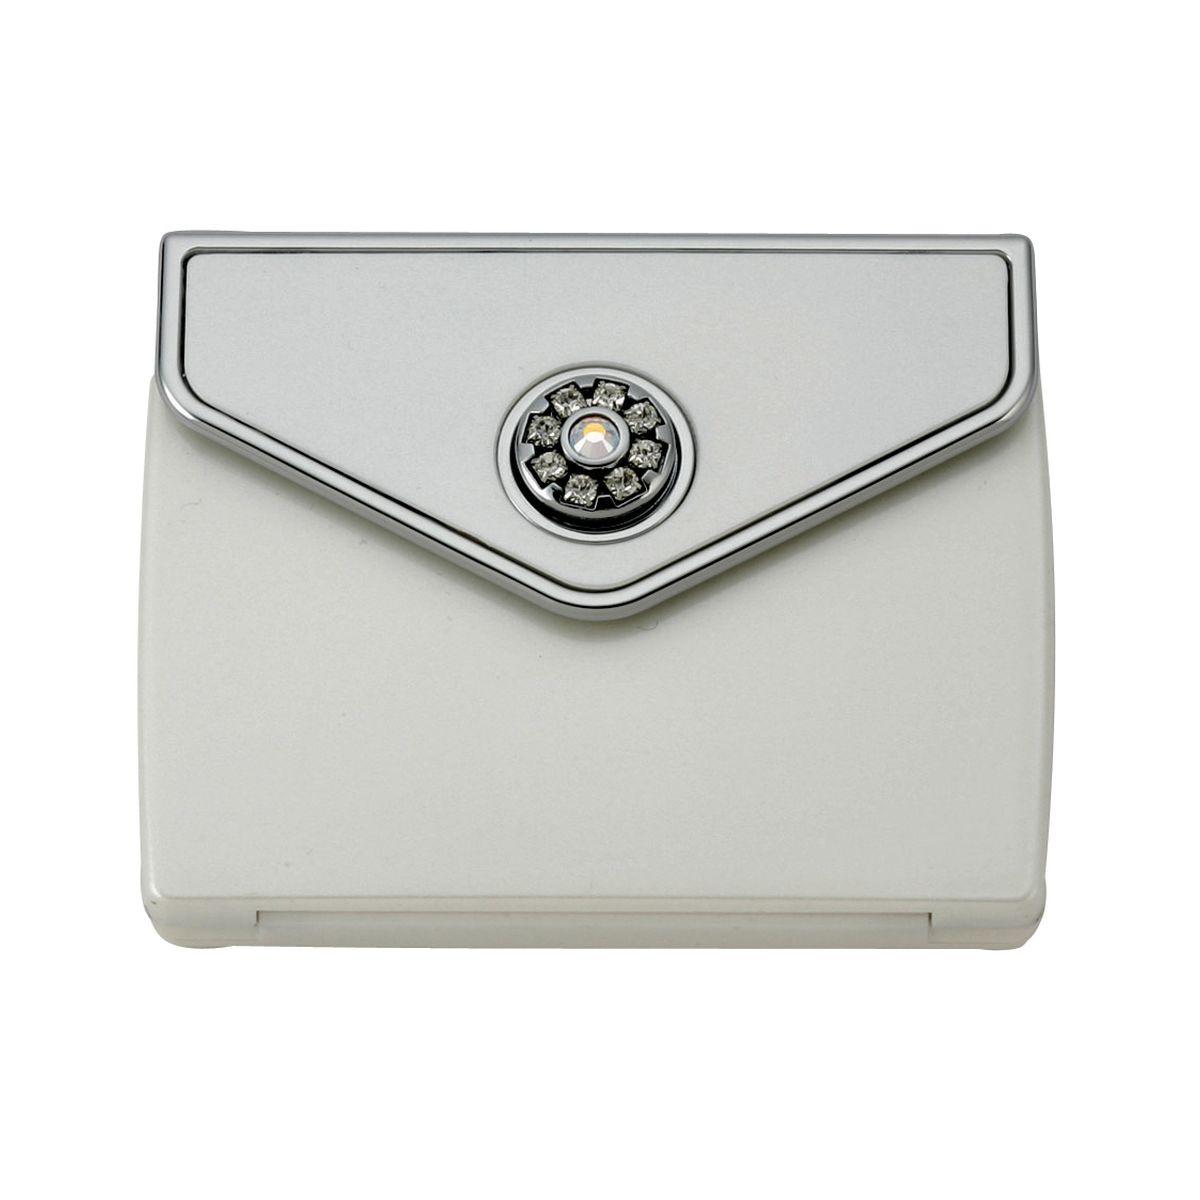 MC 336PRL - Tri Fold Envelope 5x Mirror Compact with Swarovski Crystal Elements - MC336P